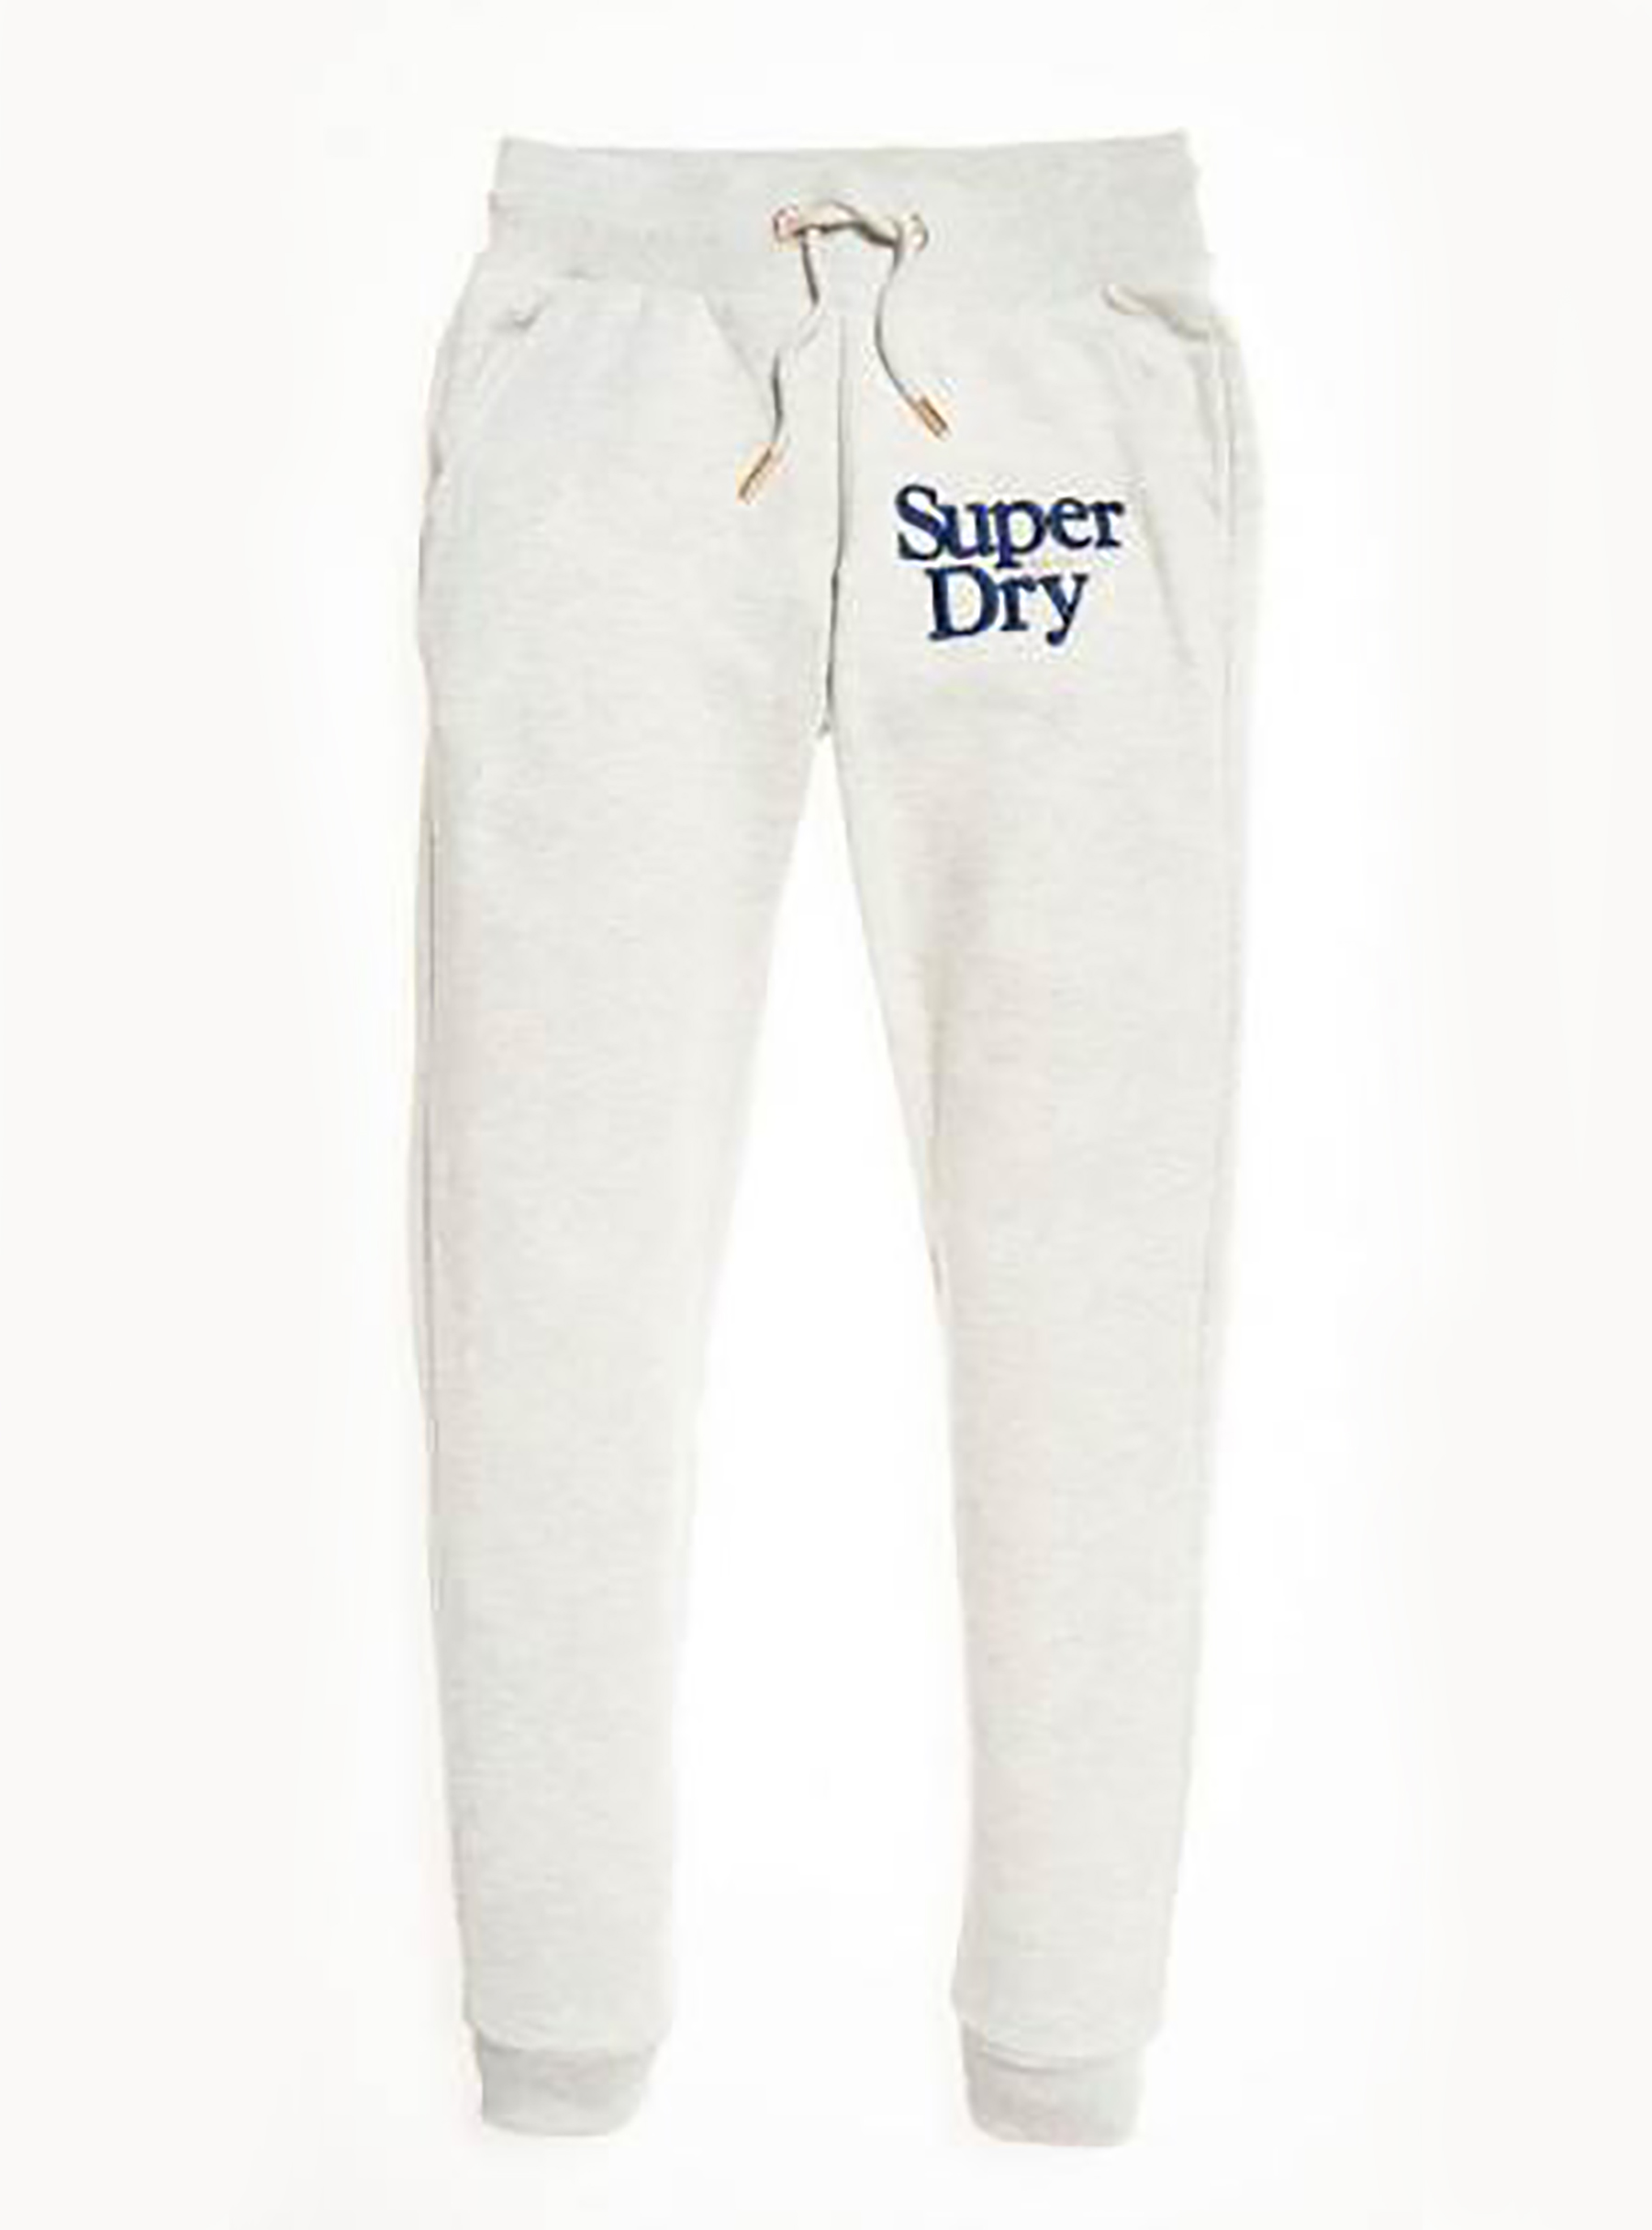 SUPERDRY 89,99 €